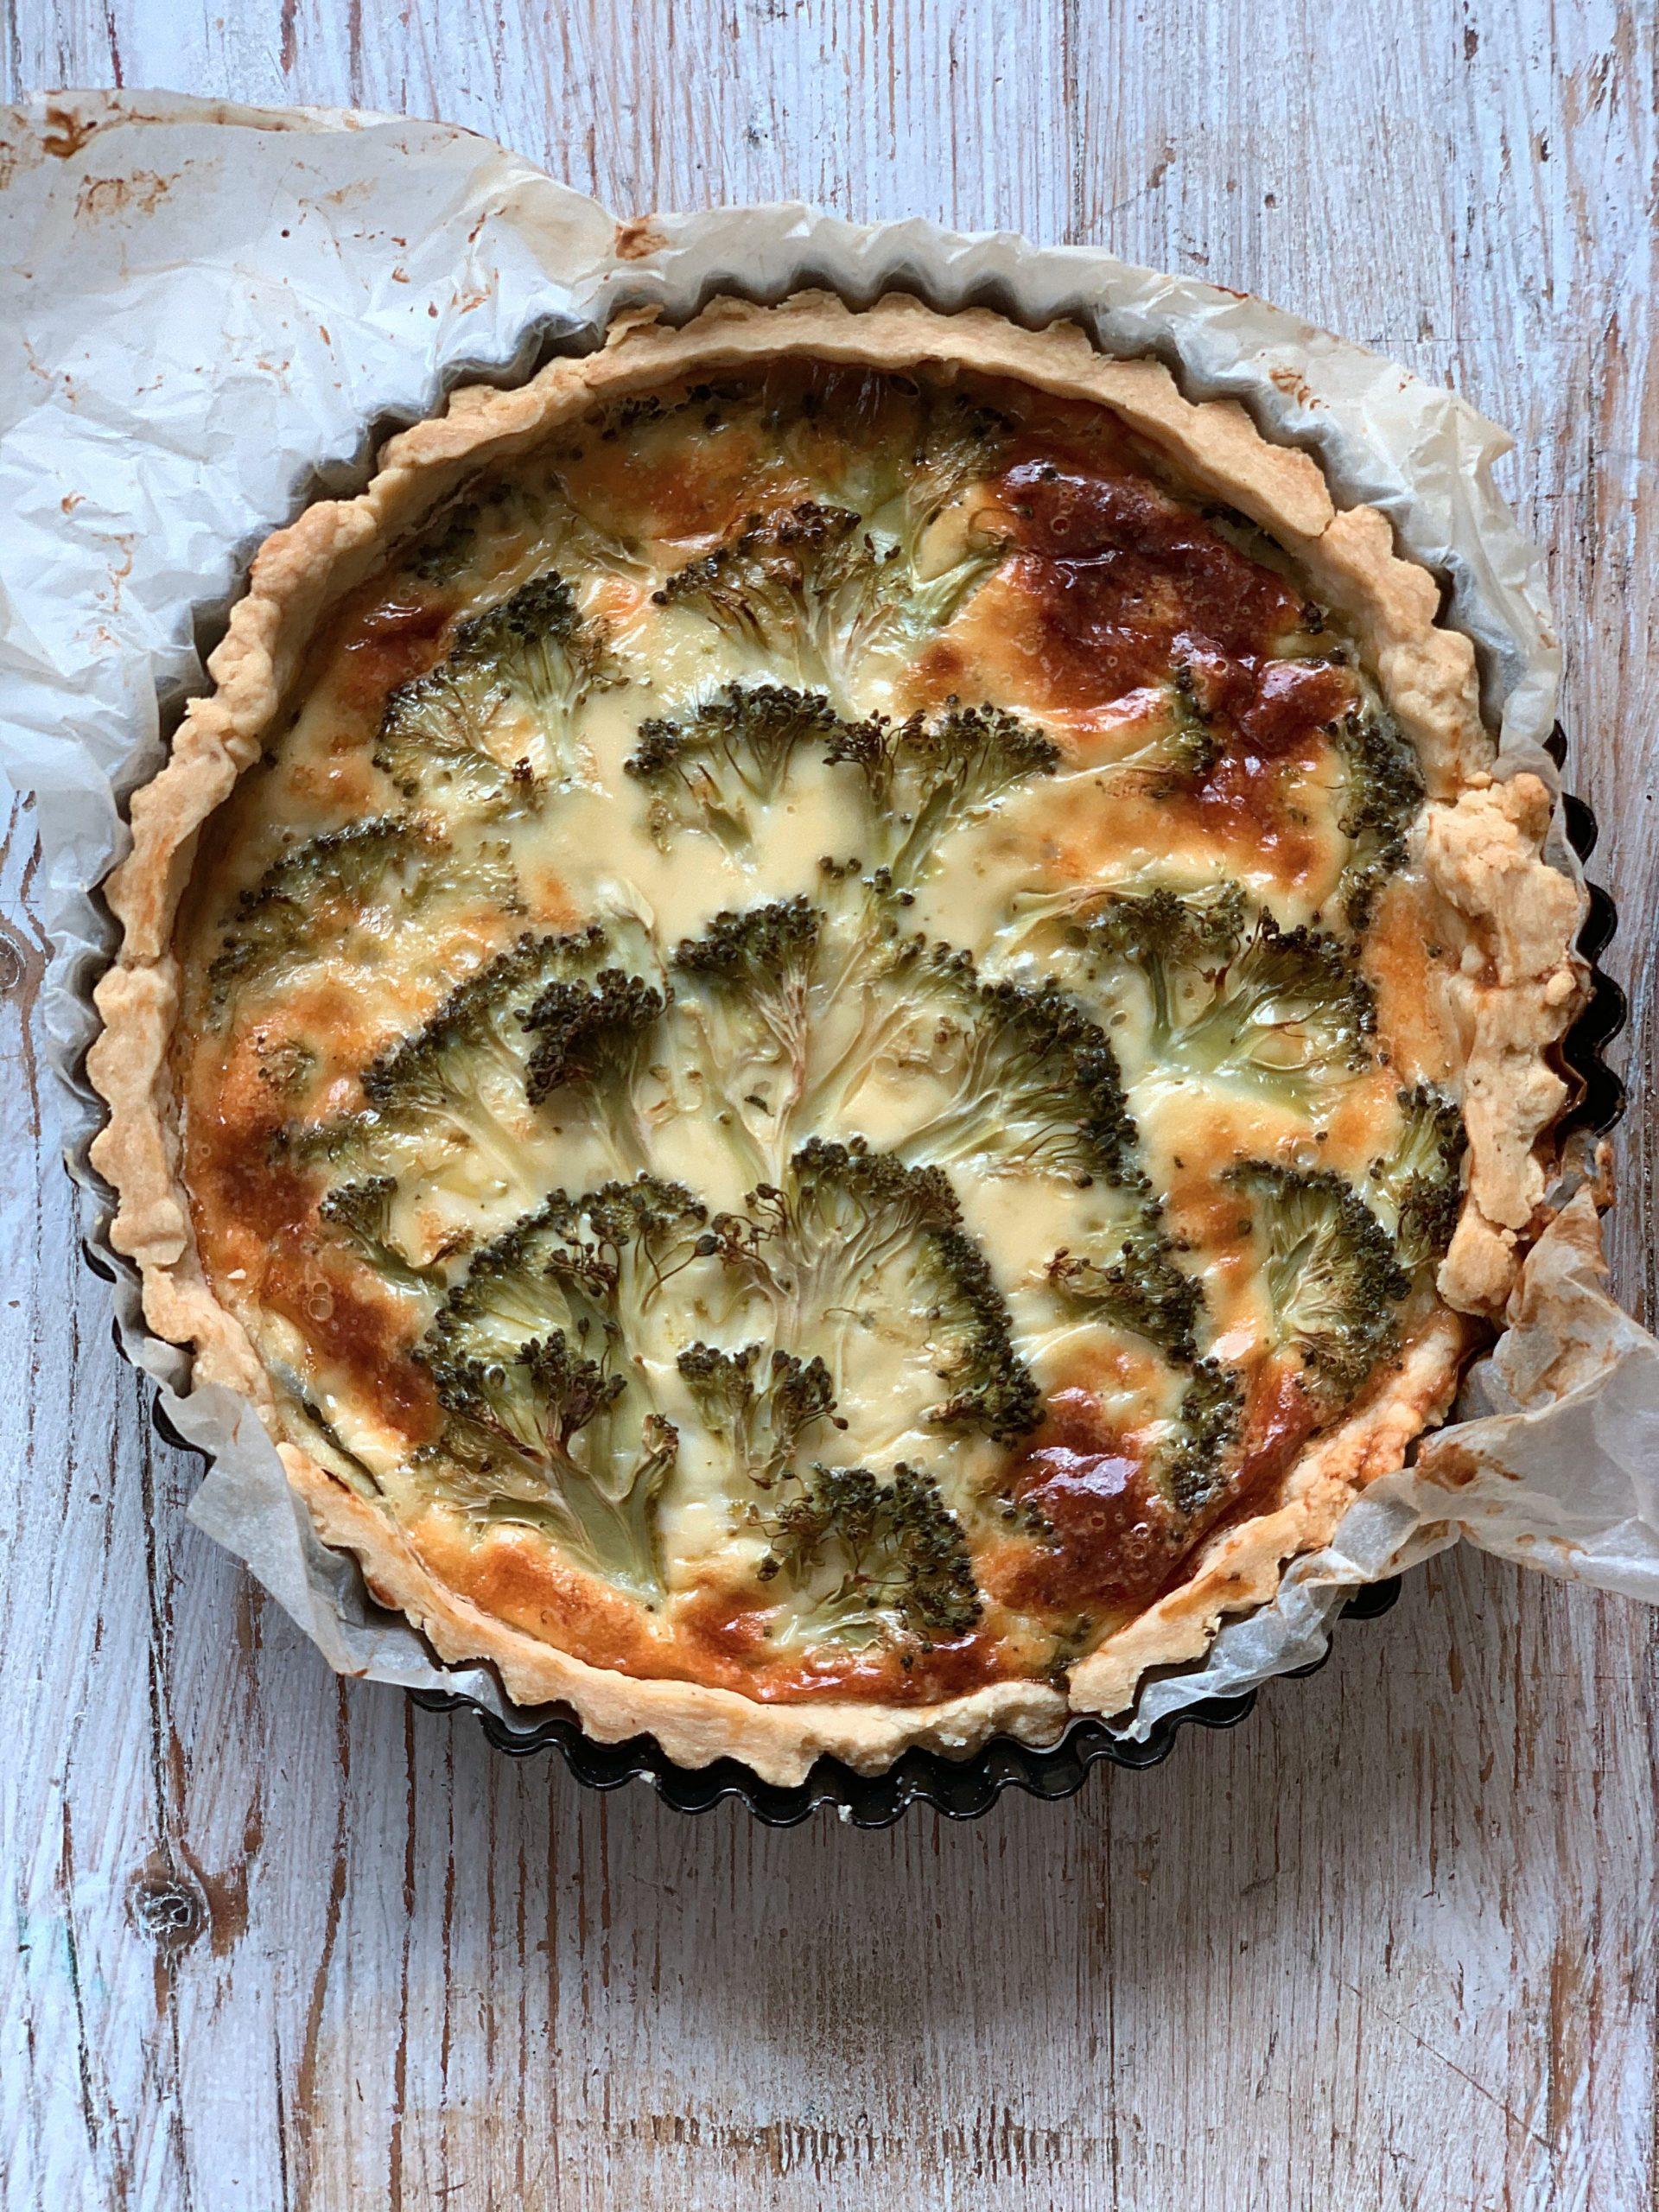 broccoli blue cheese tart pic: Kerstin rodgers/msmarmitelover.com